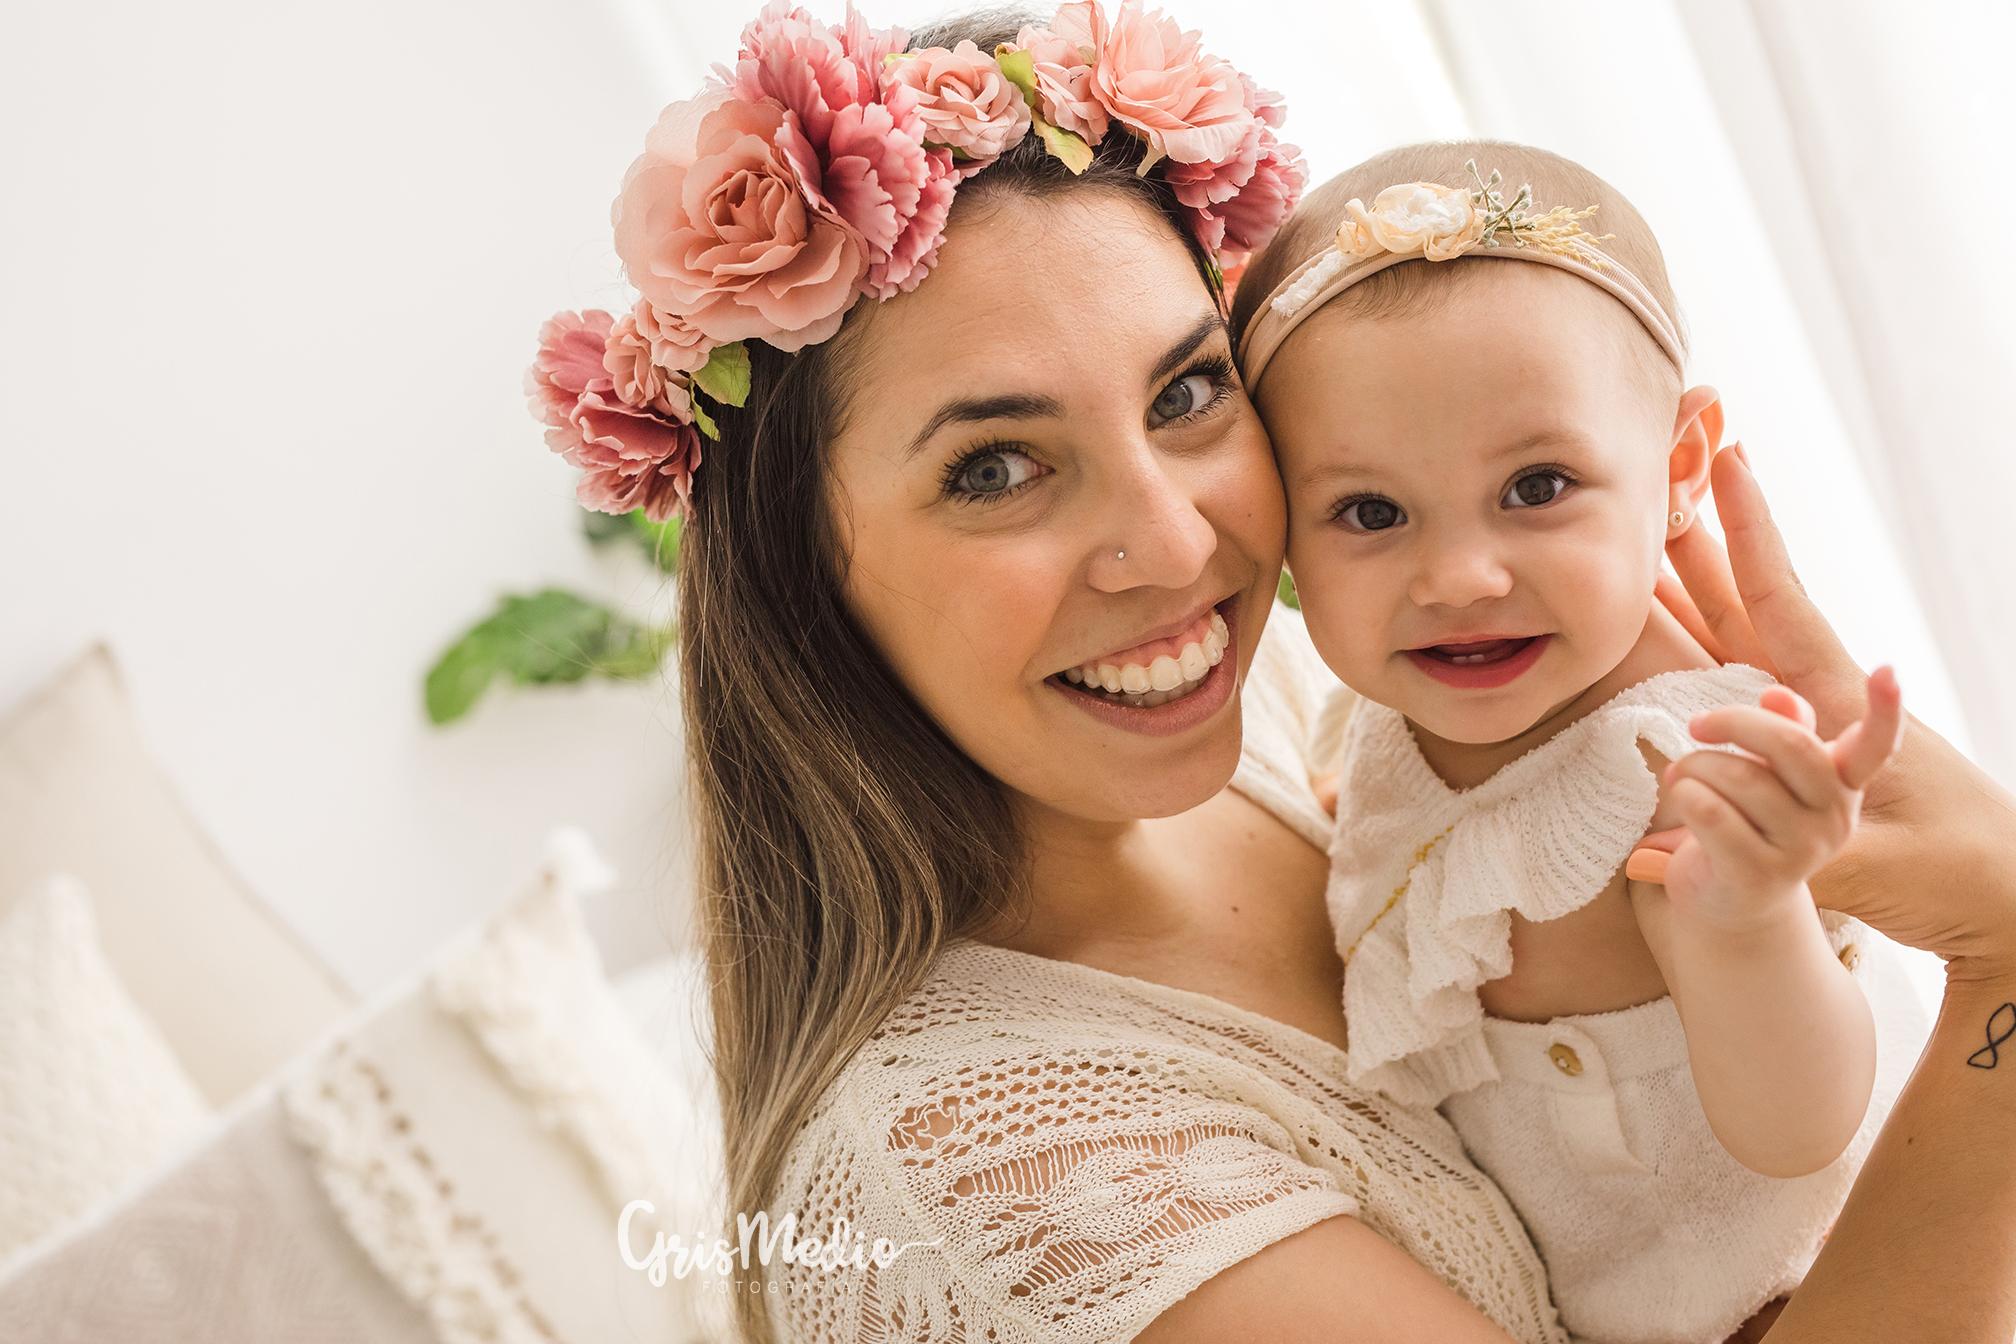 infantil-lactancia-zaragoza-familia-fotografia-8